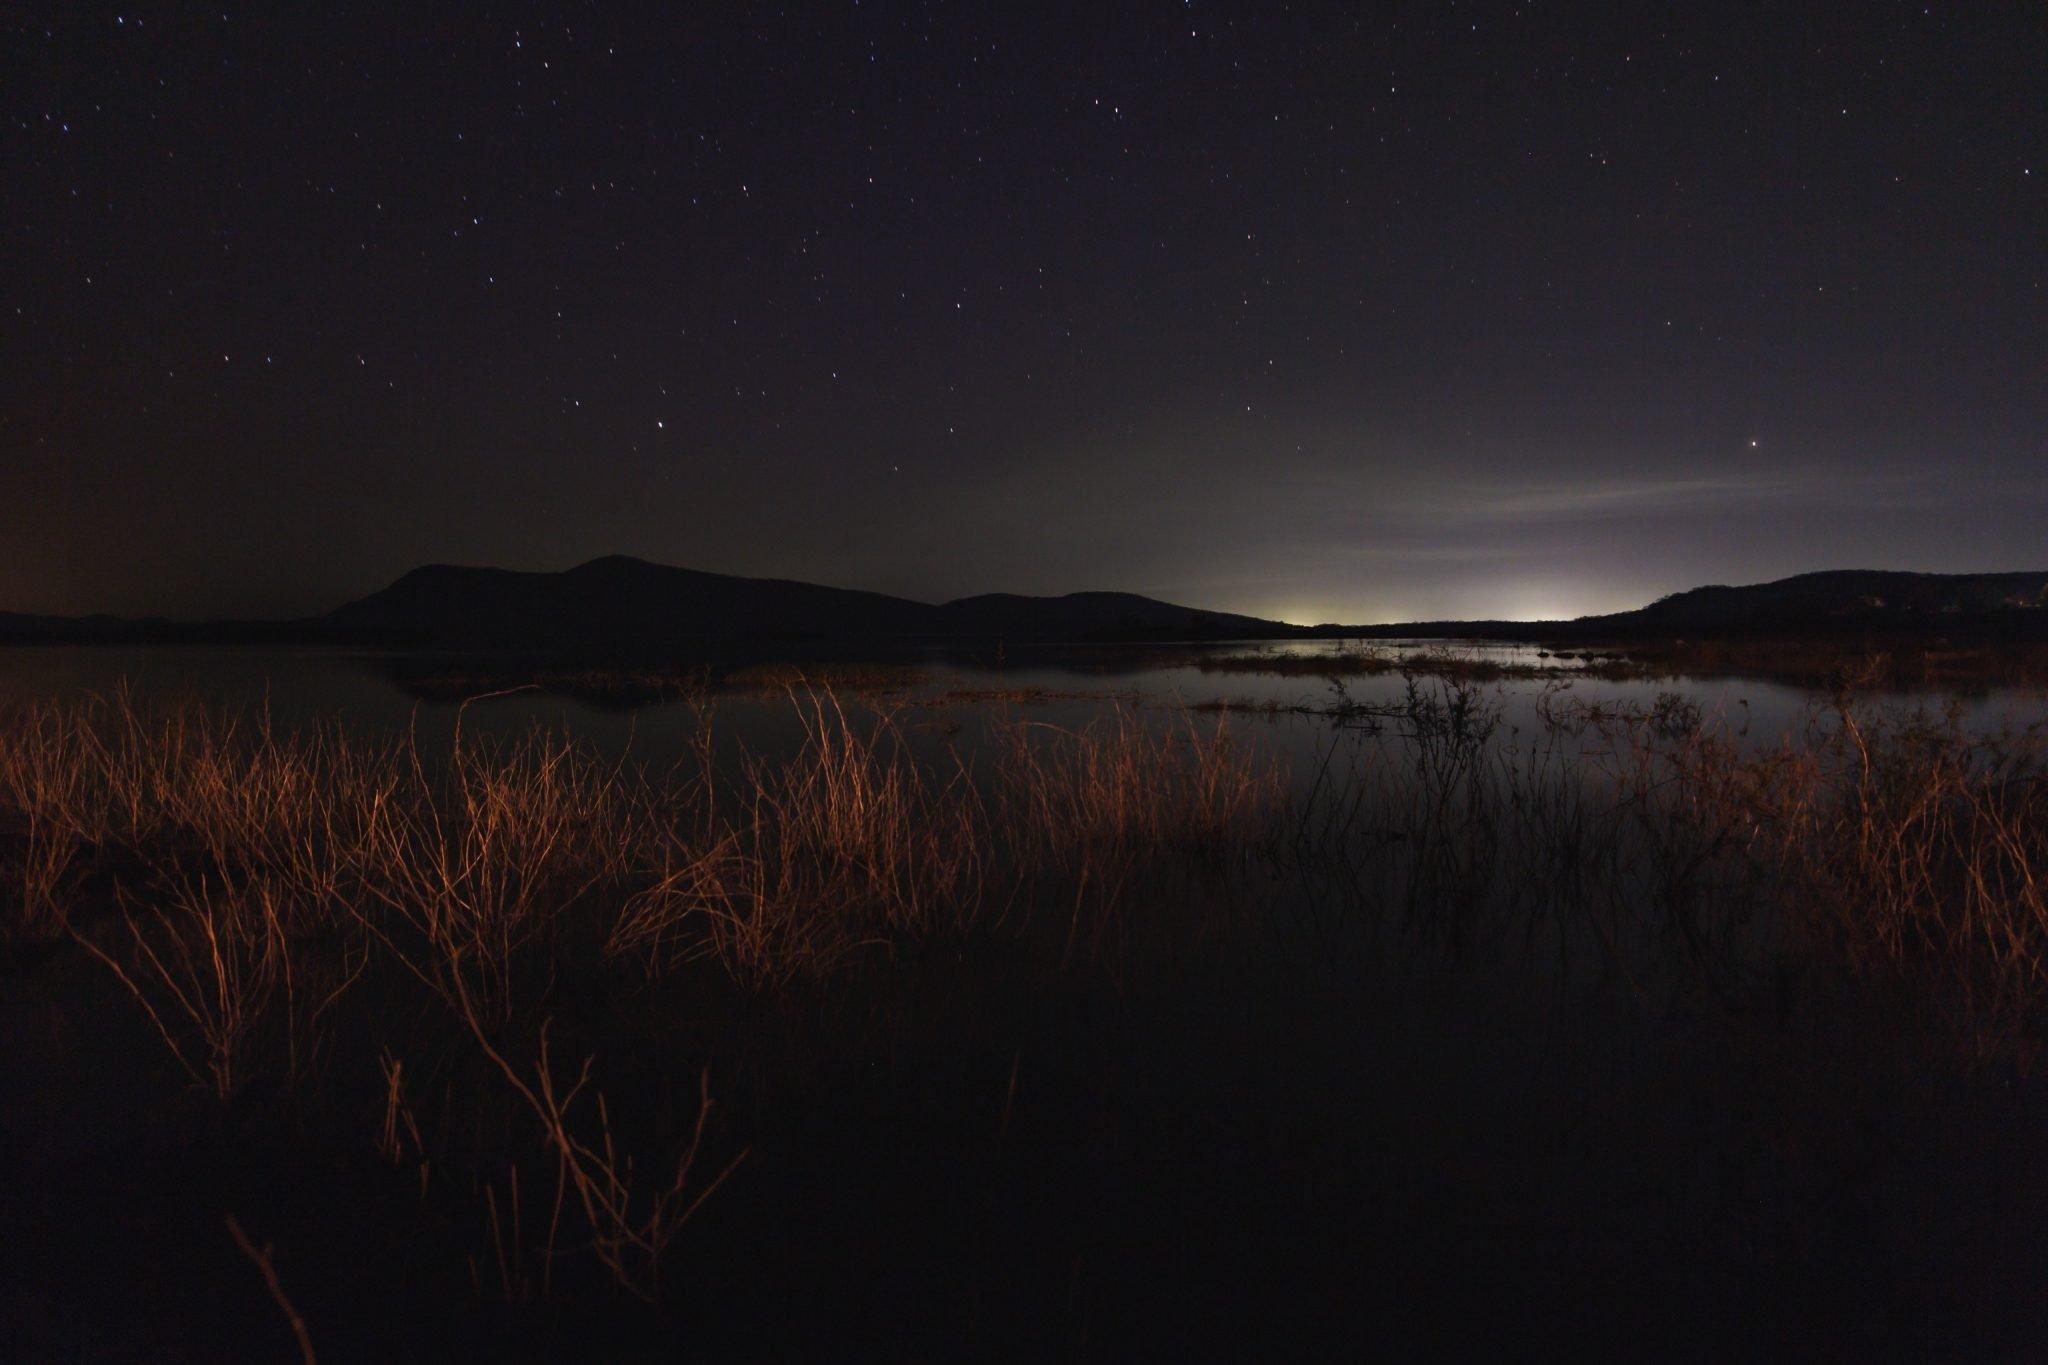 Sinazongwe at night